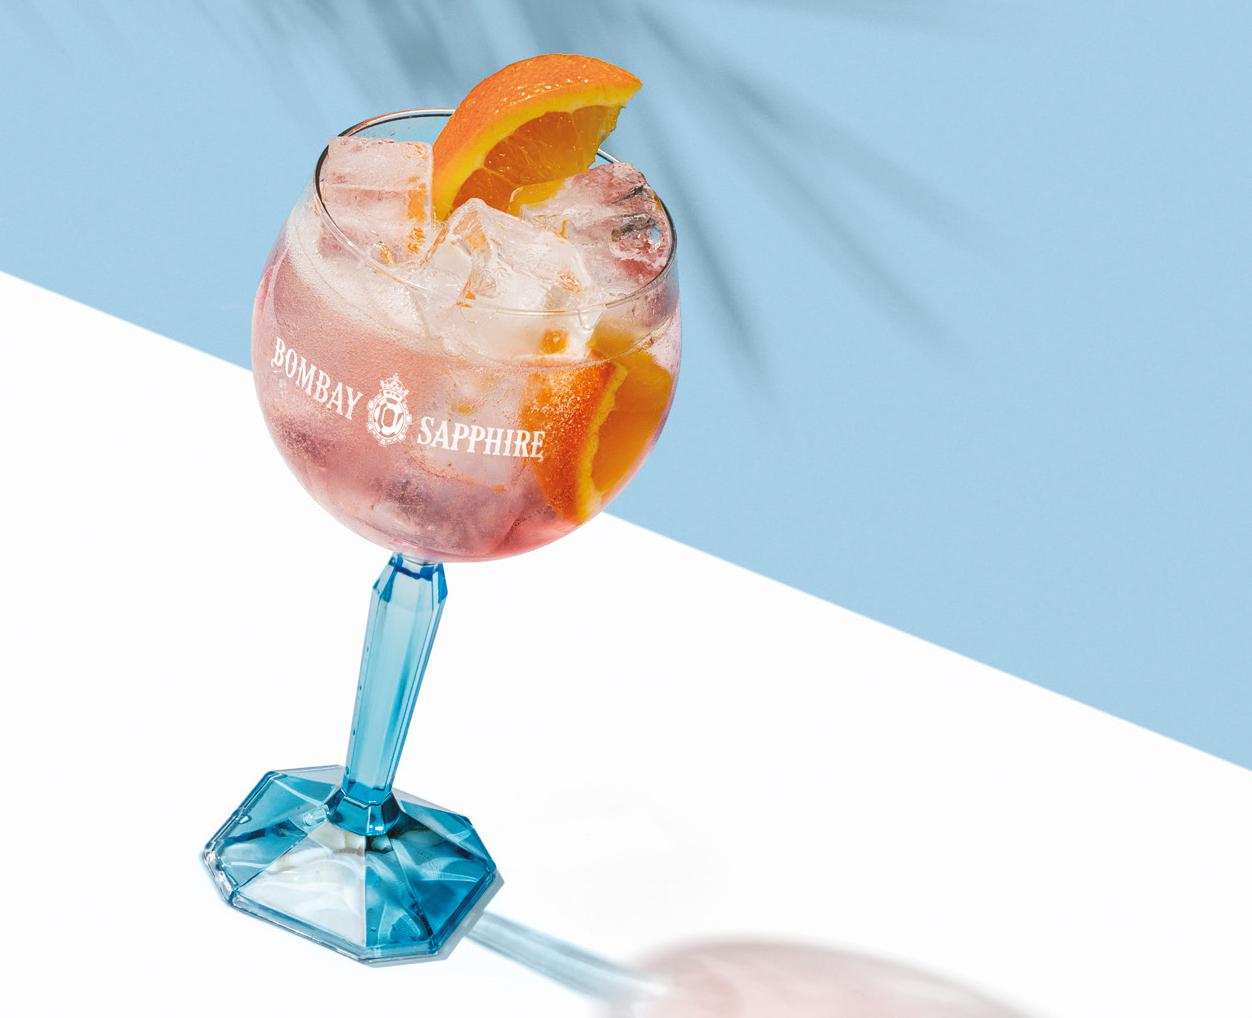 Bombay Sapphire Gin Rose Spritz